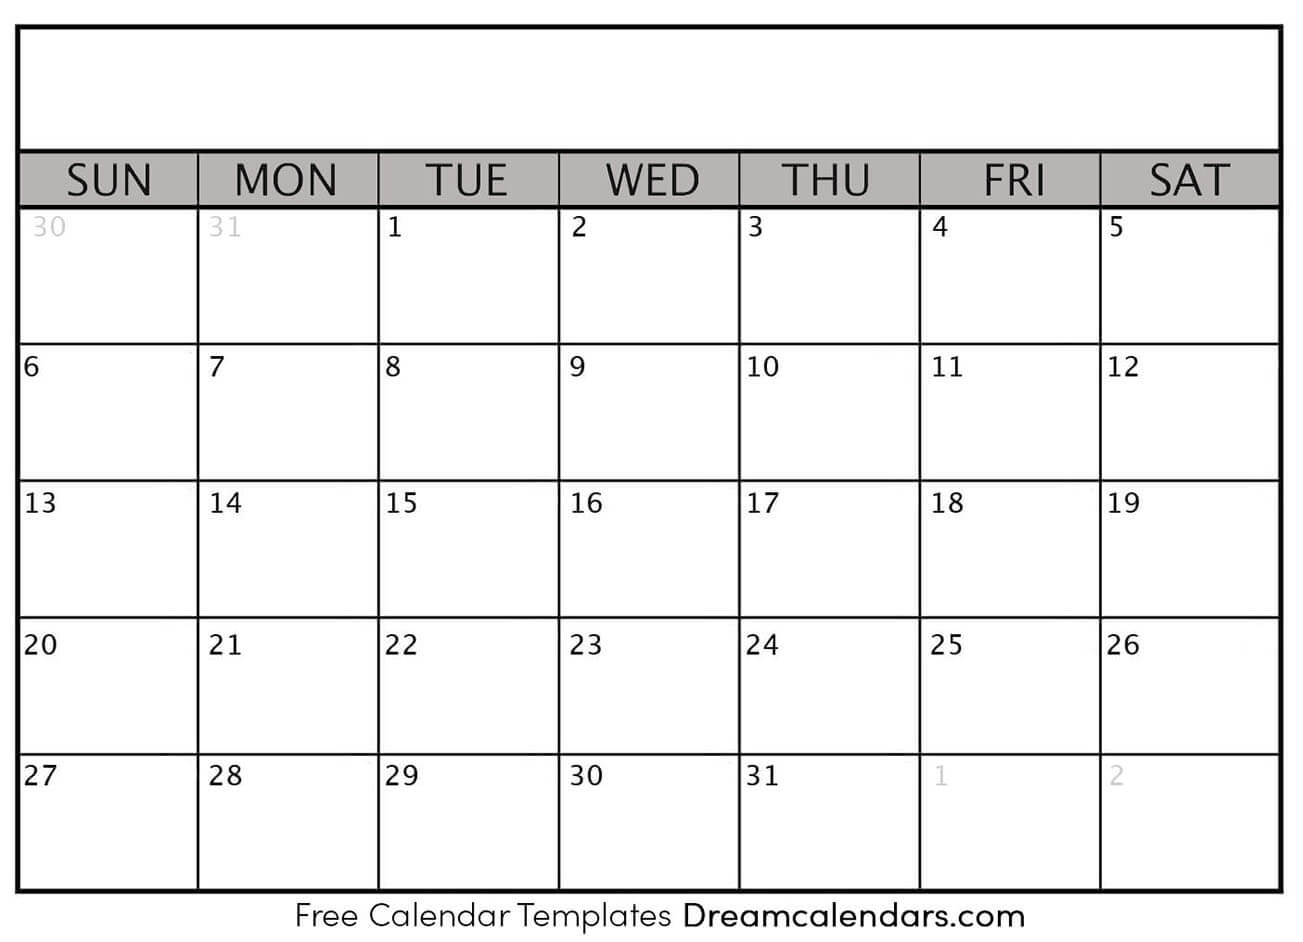 Printable Blank Calendar - Dream Calendars